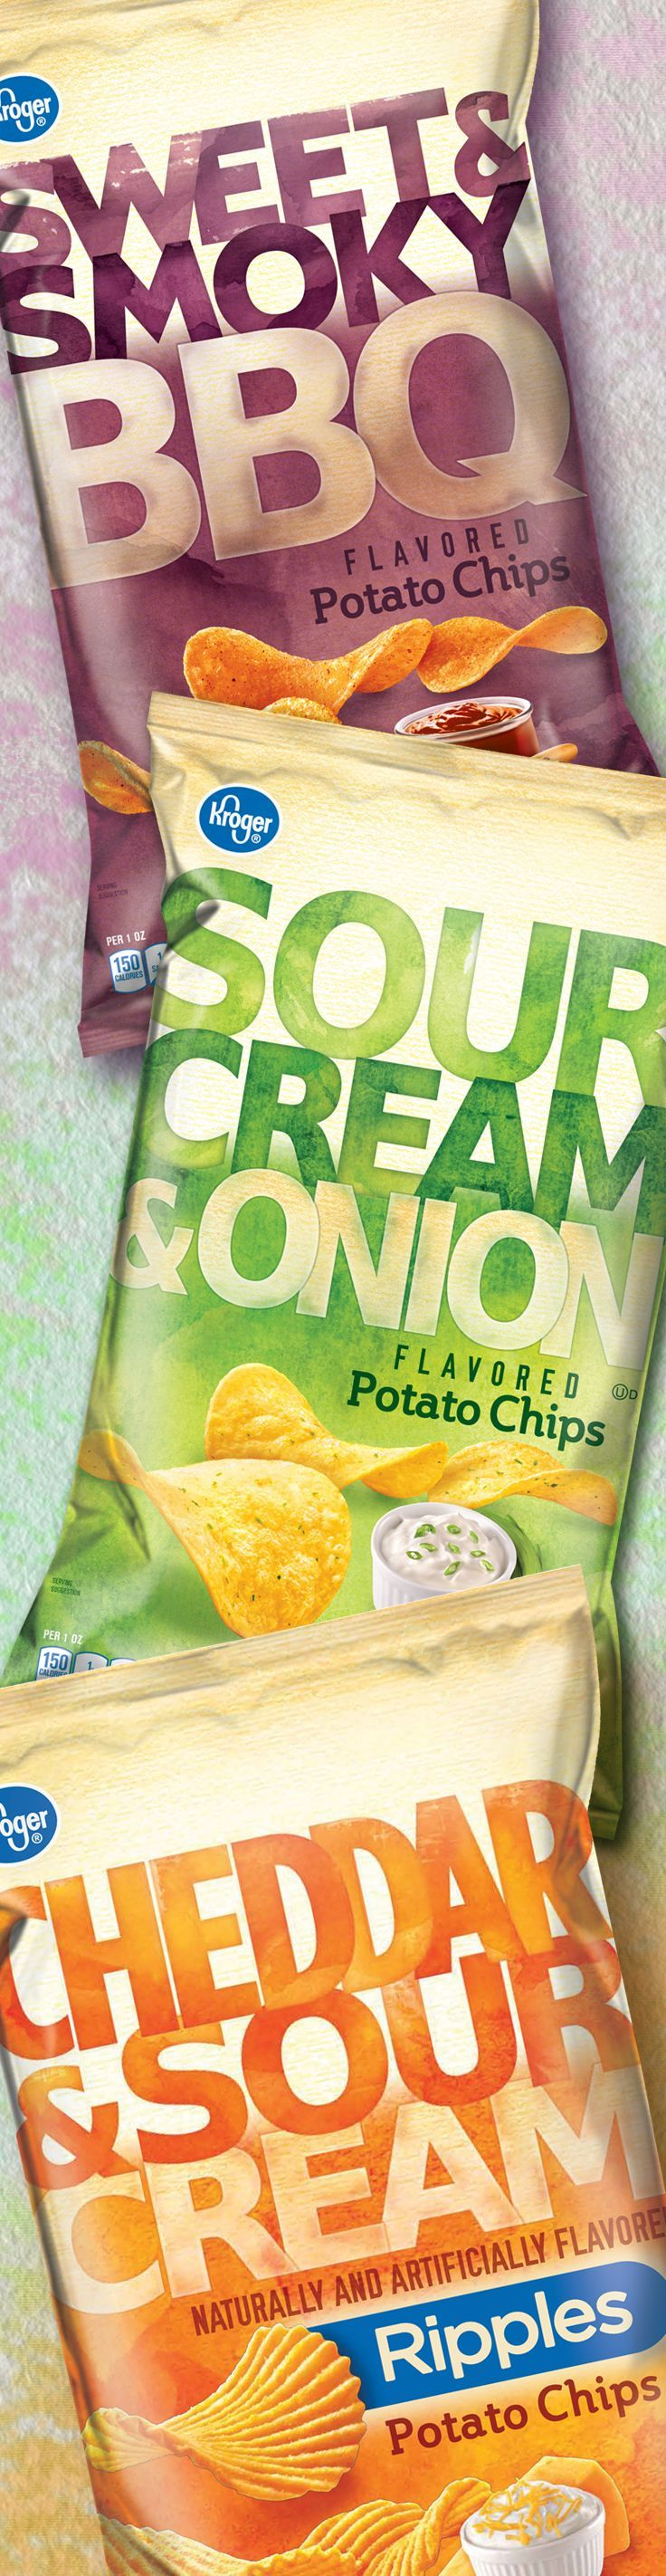 Kroger Potato Chips by Design Resource Center